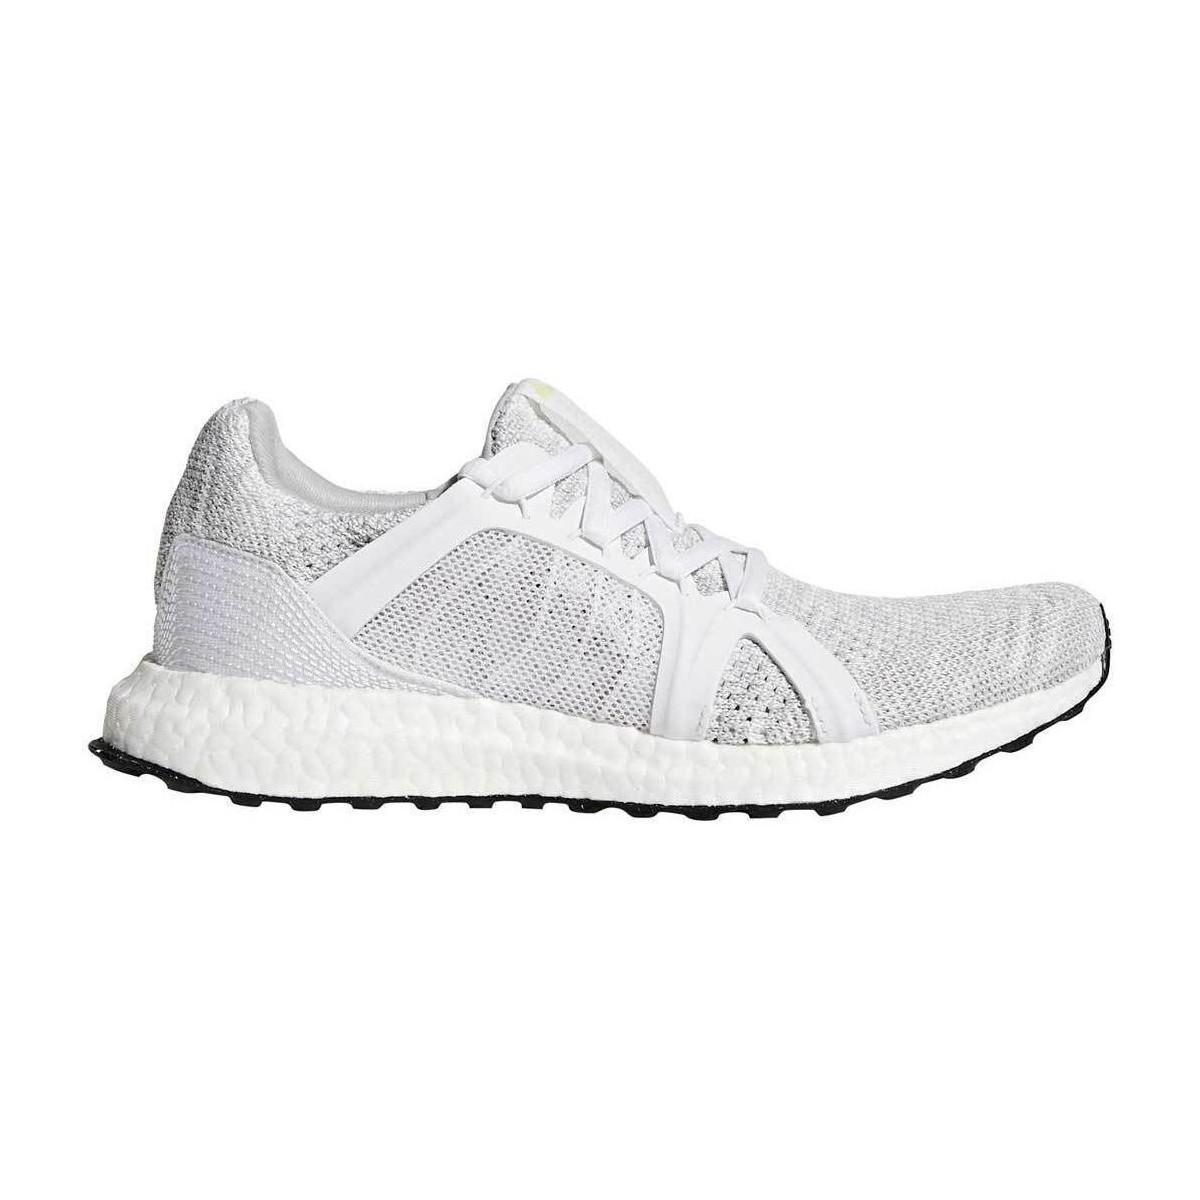 e05a9a2cc40 adidas Ultra Boost X Parley Shoes - Stone - 4 Multicolour Women s ...